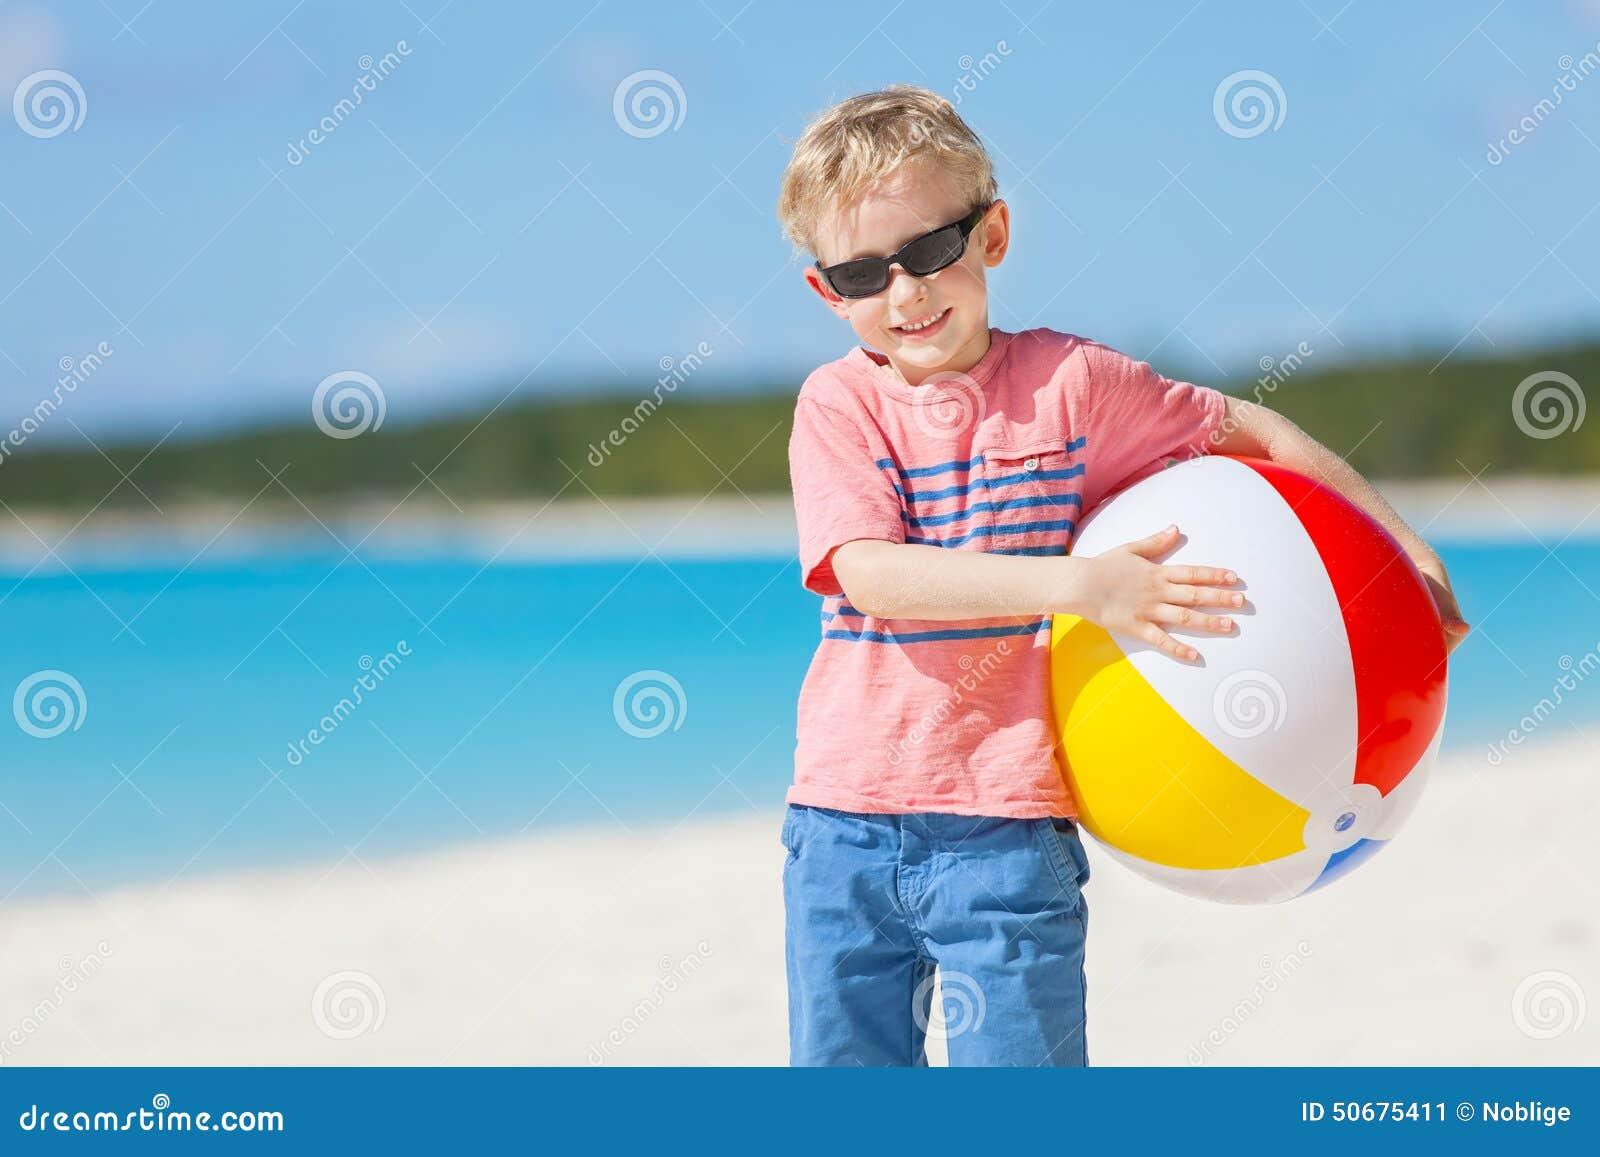 Download 在海滩的孩子 库存图片. 图片 包括有 白种人, 嬉戏, 加勒比, 童年, 男朋友, 外面, 放血, 喜悦 - 50675411